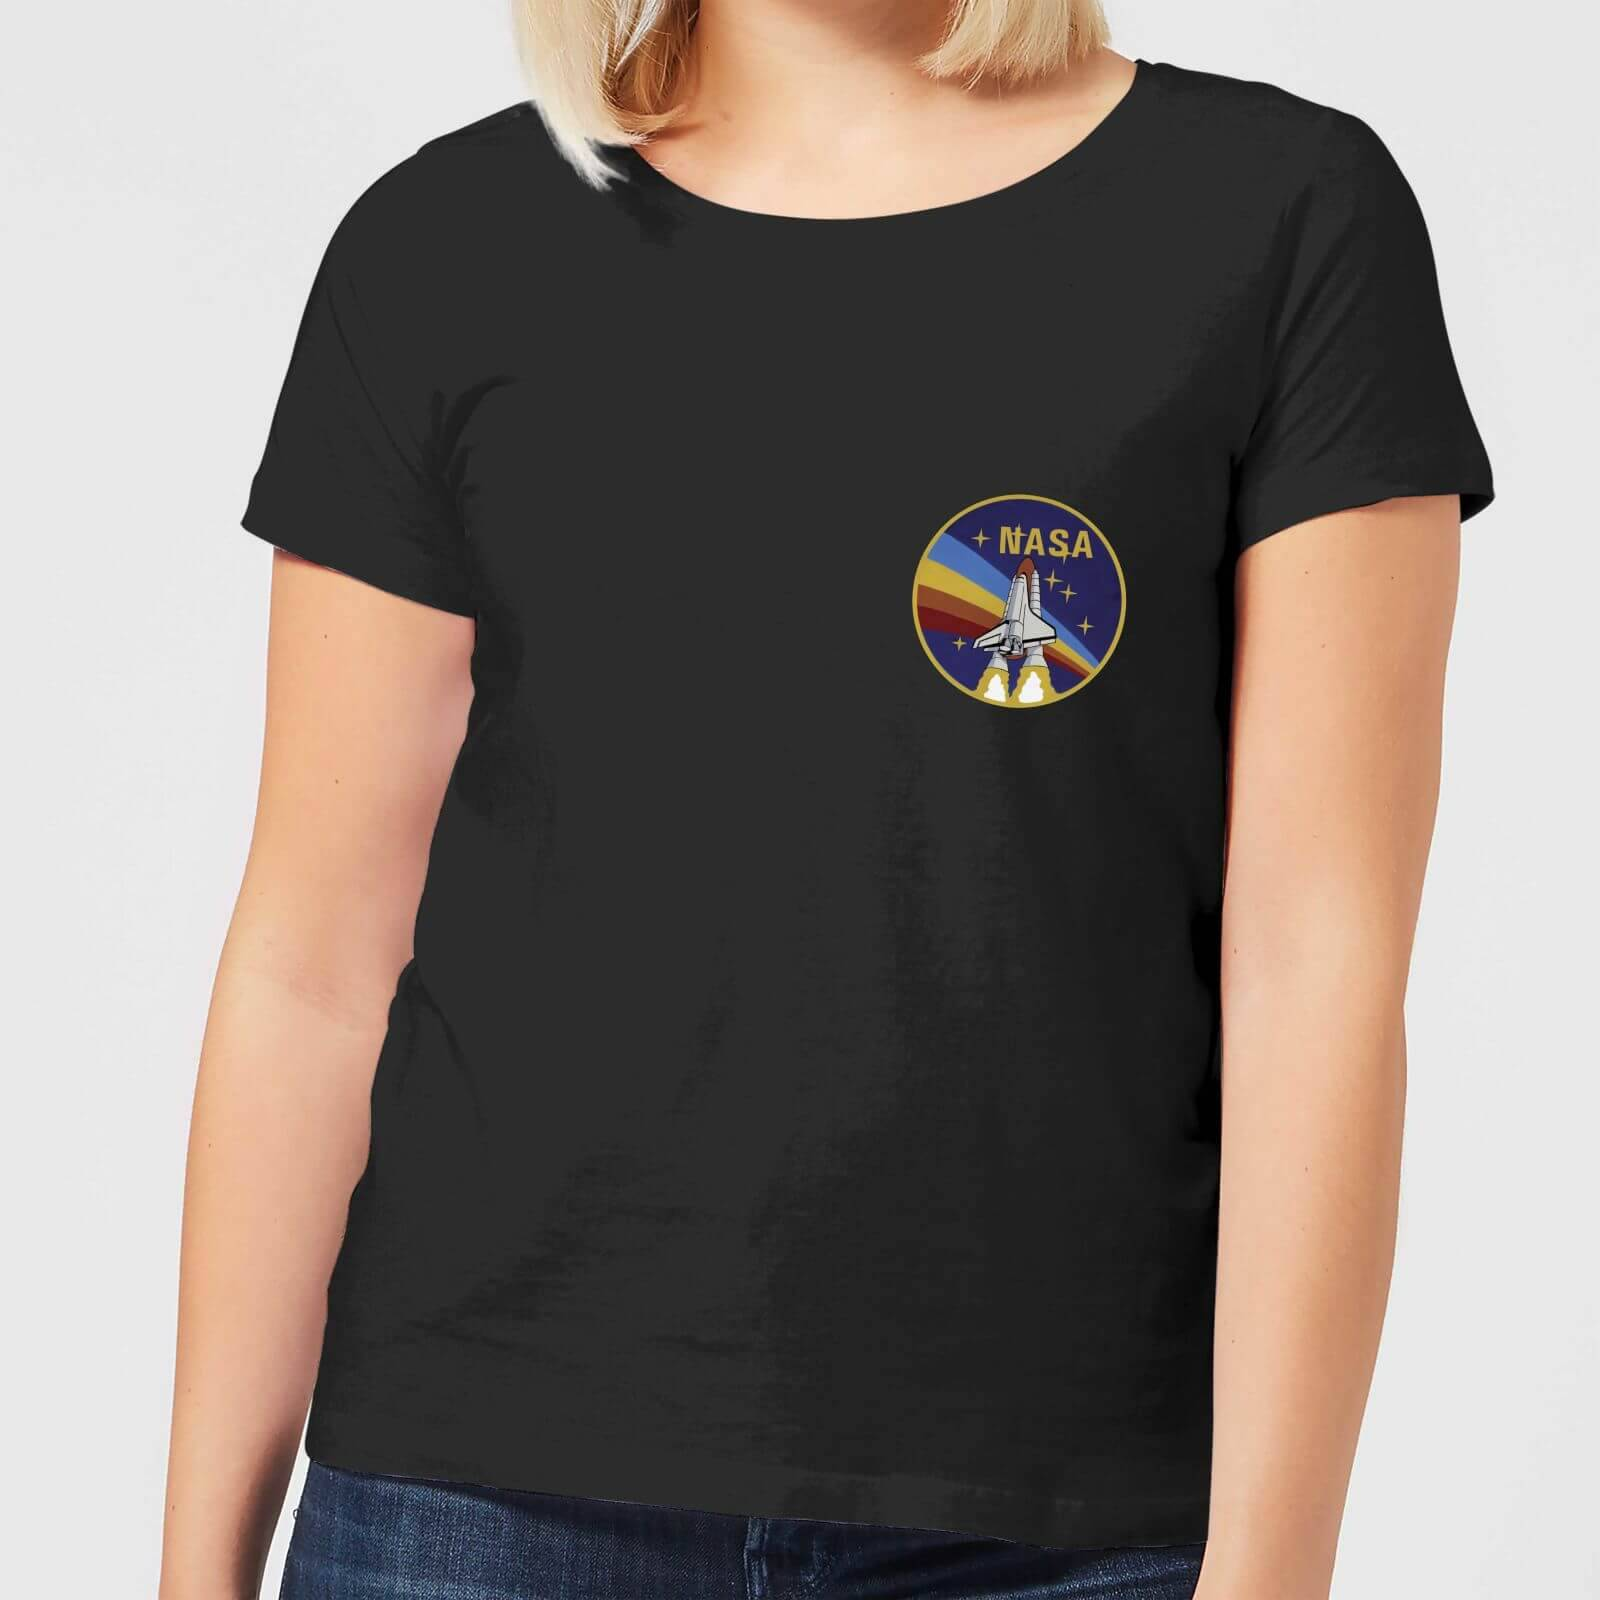 NASA Vintage Rainbow Shuttle Women's T-Shirt - Black - XS - Black